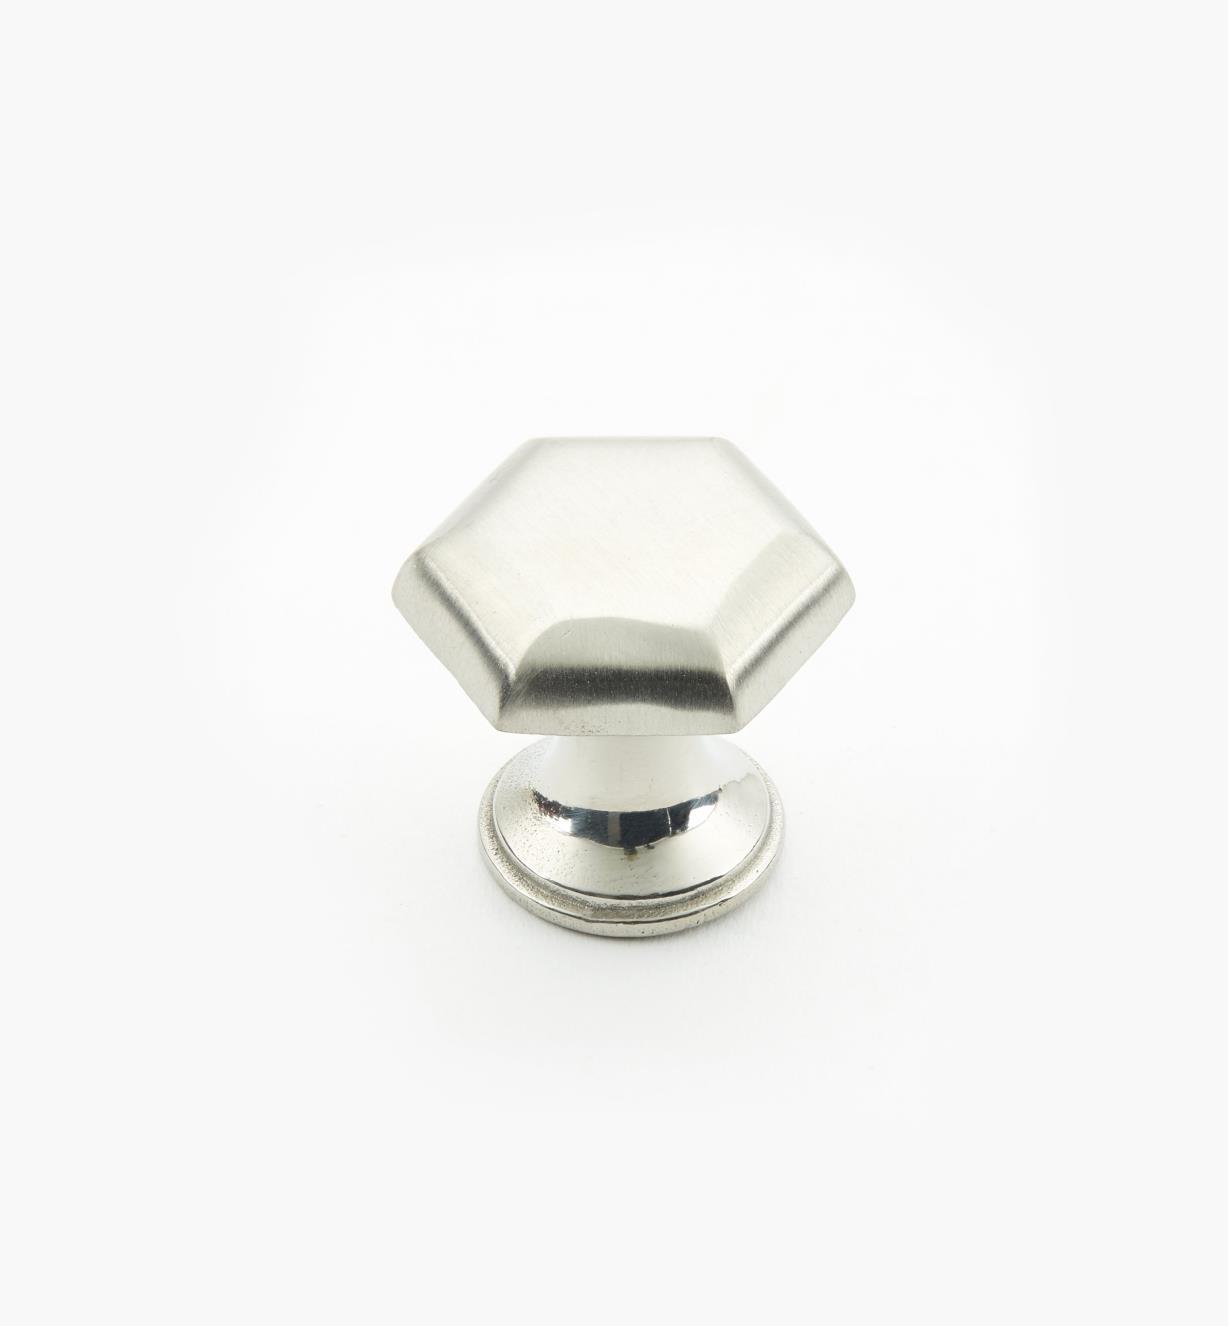 01W8290 - Bouton hexagonal en acier inoxydable, 1pox7/8po